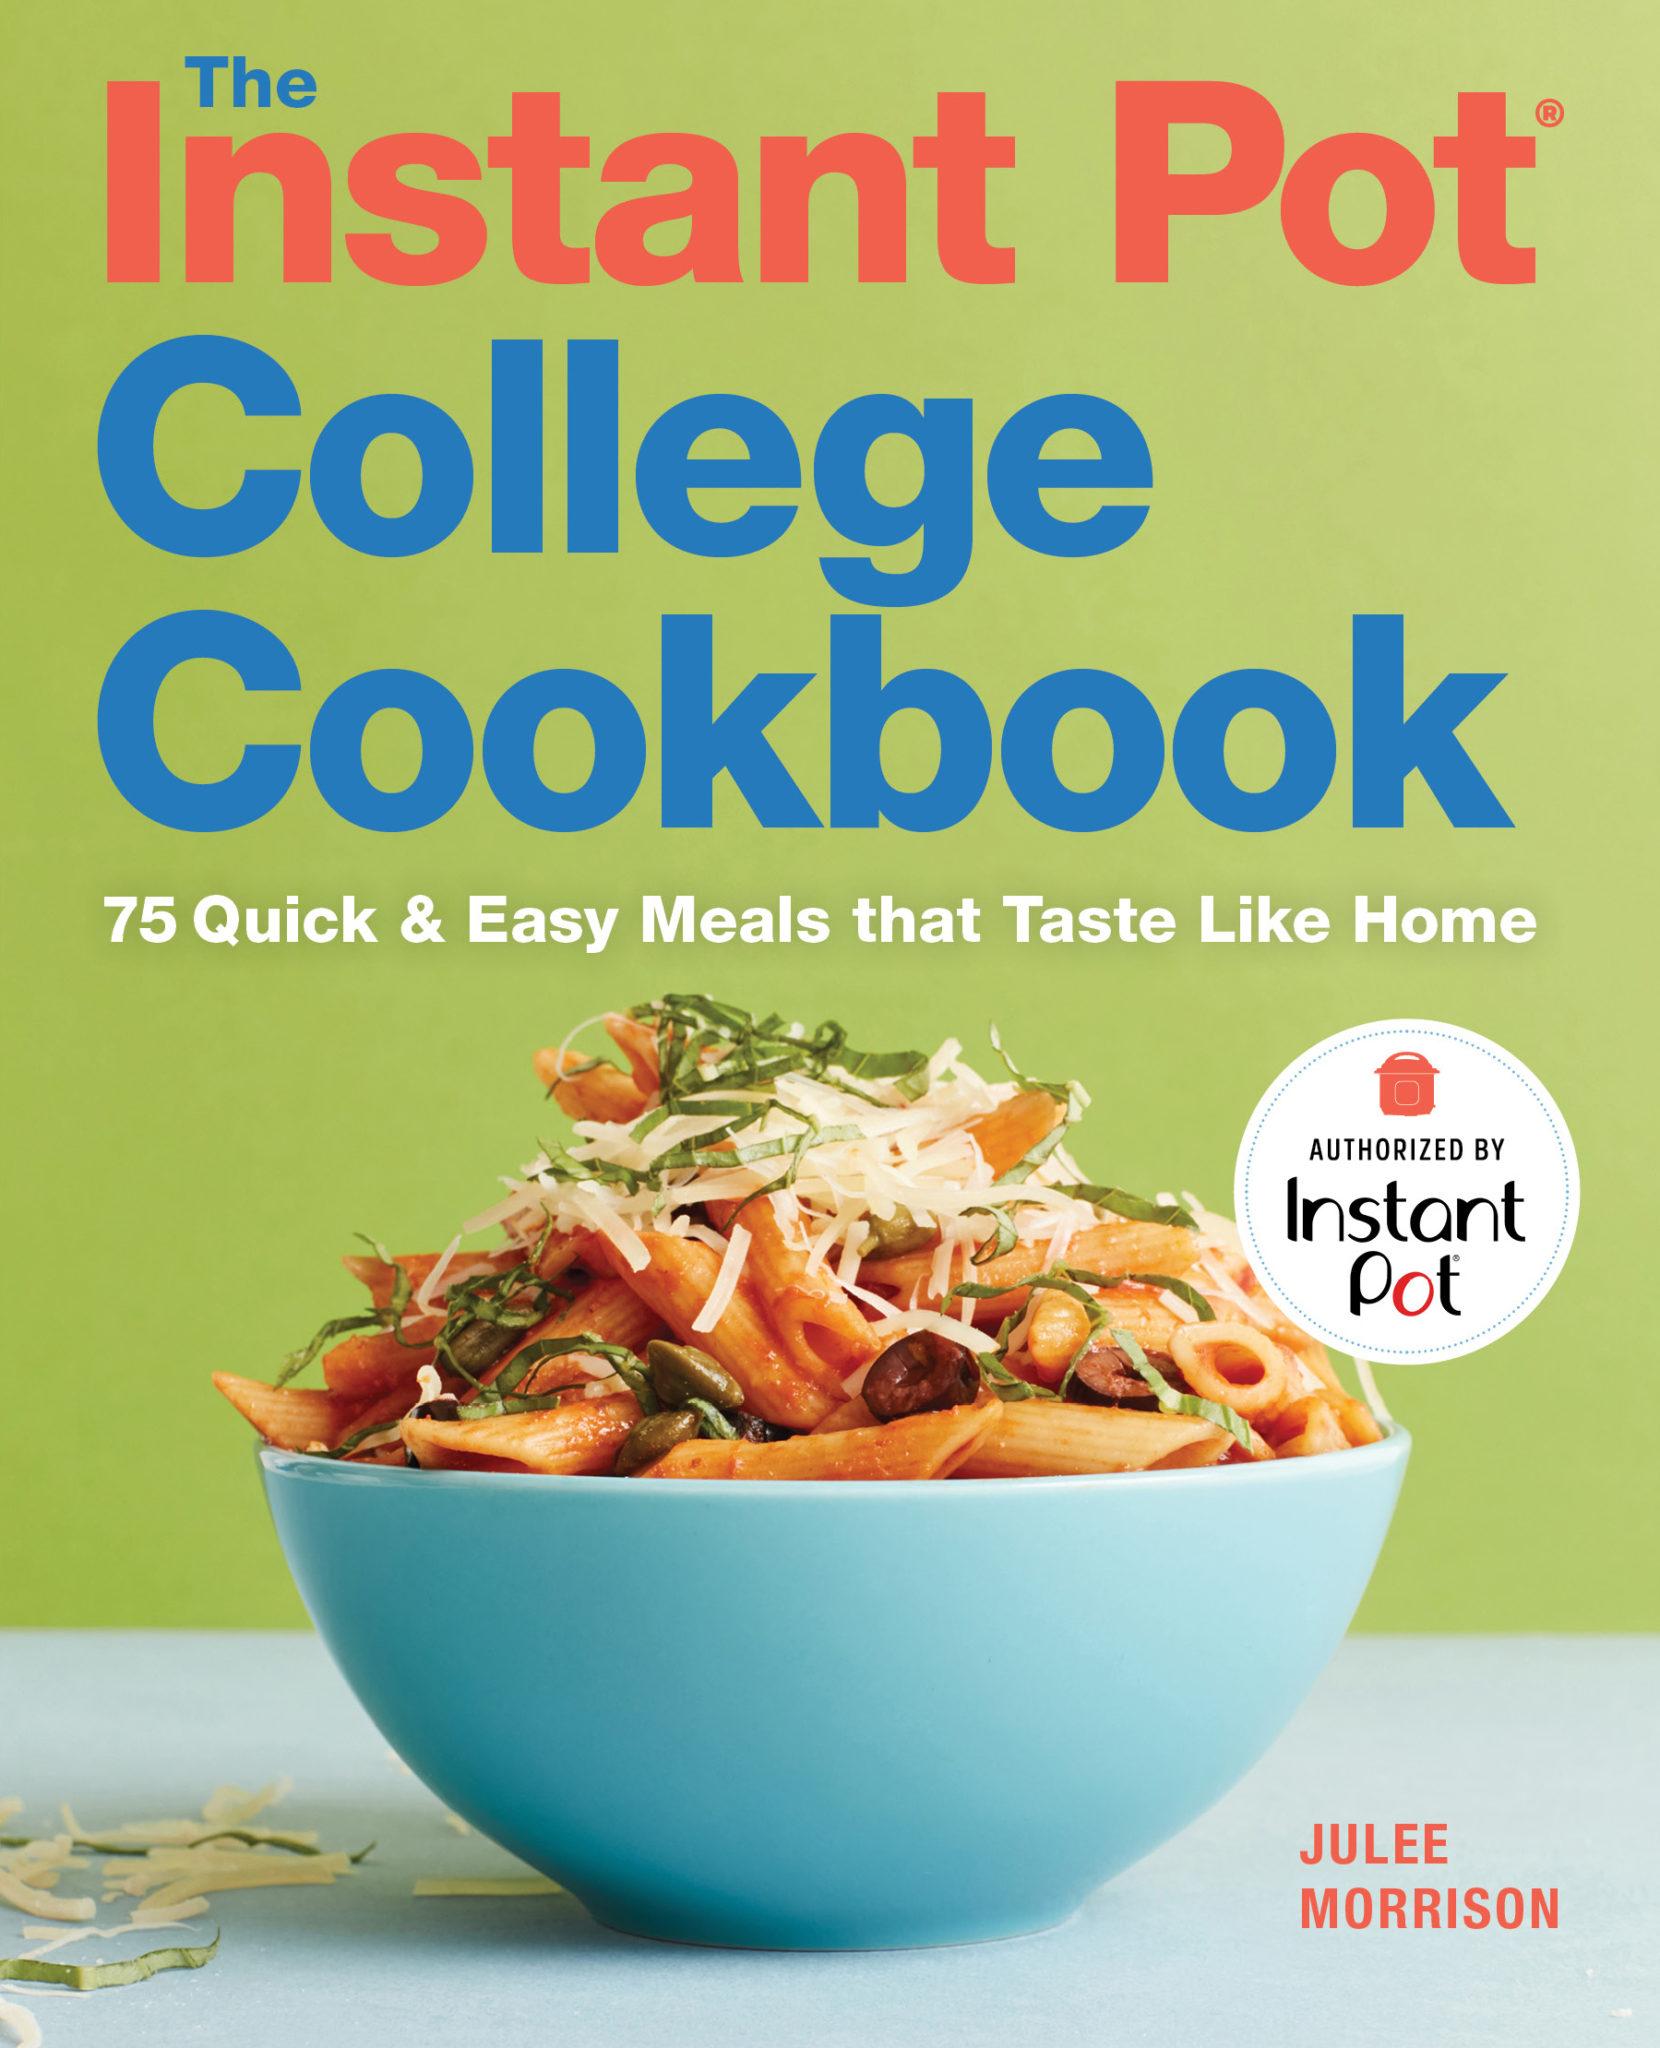 The Instant Pot College Cookbook by Julee Morrison